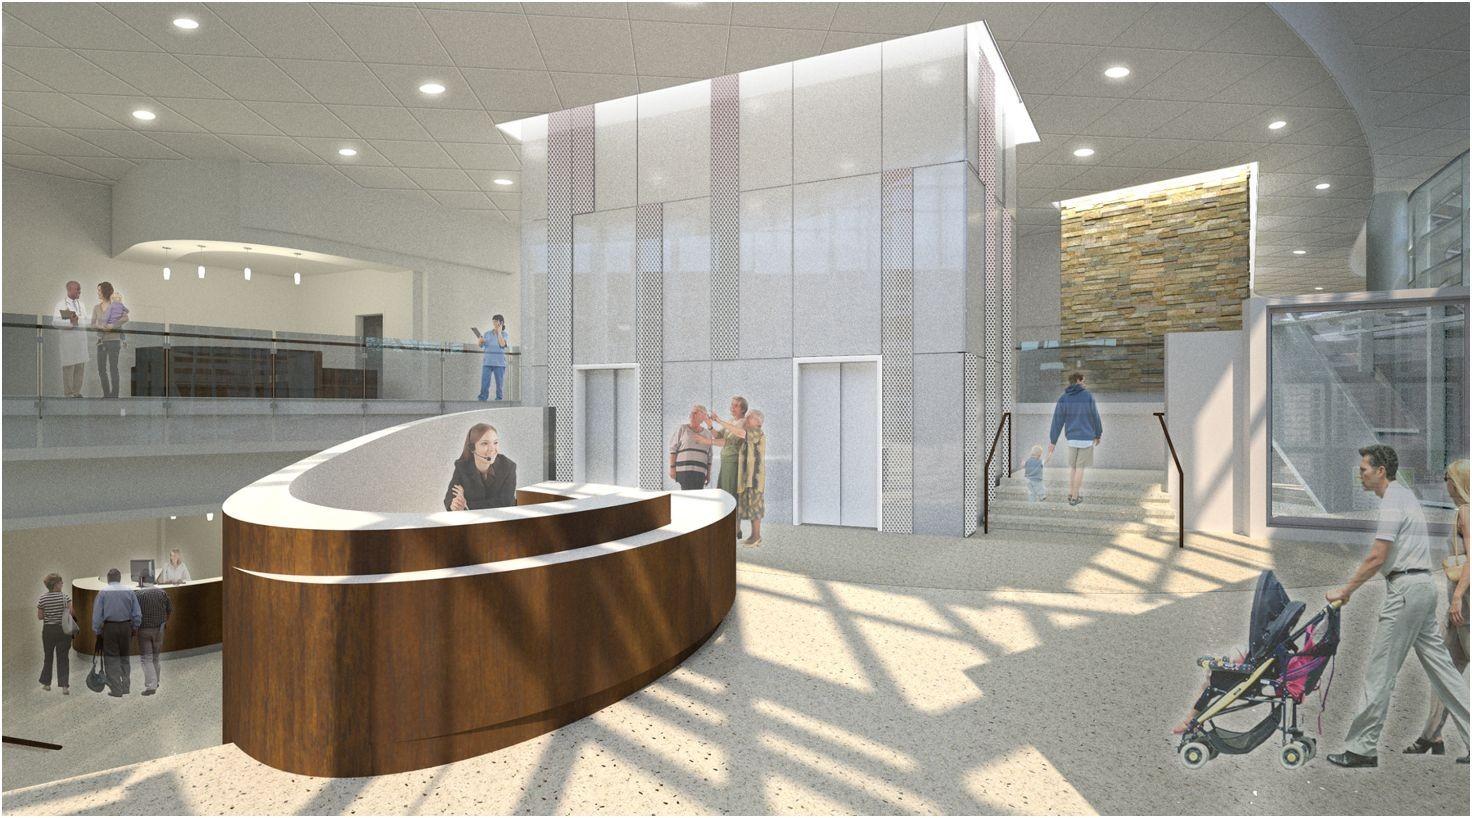 Gallery of Advocate Illinois Masonic Medical Center ...